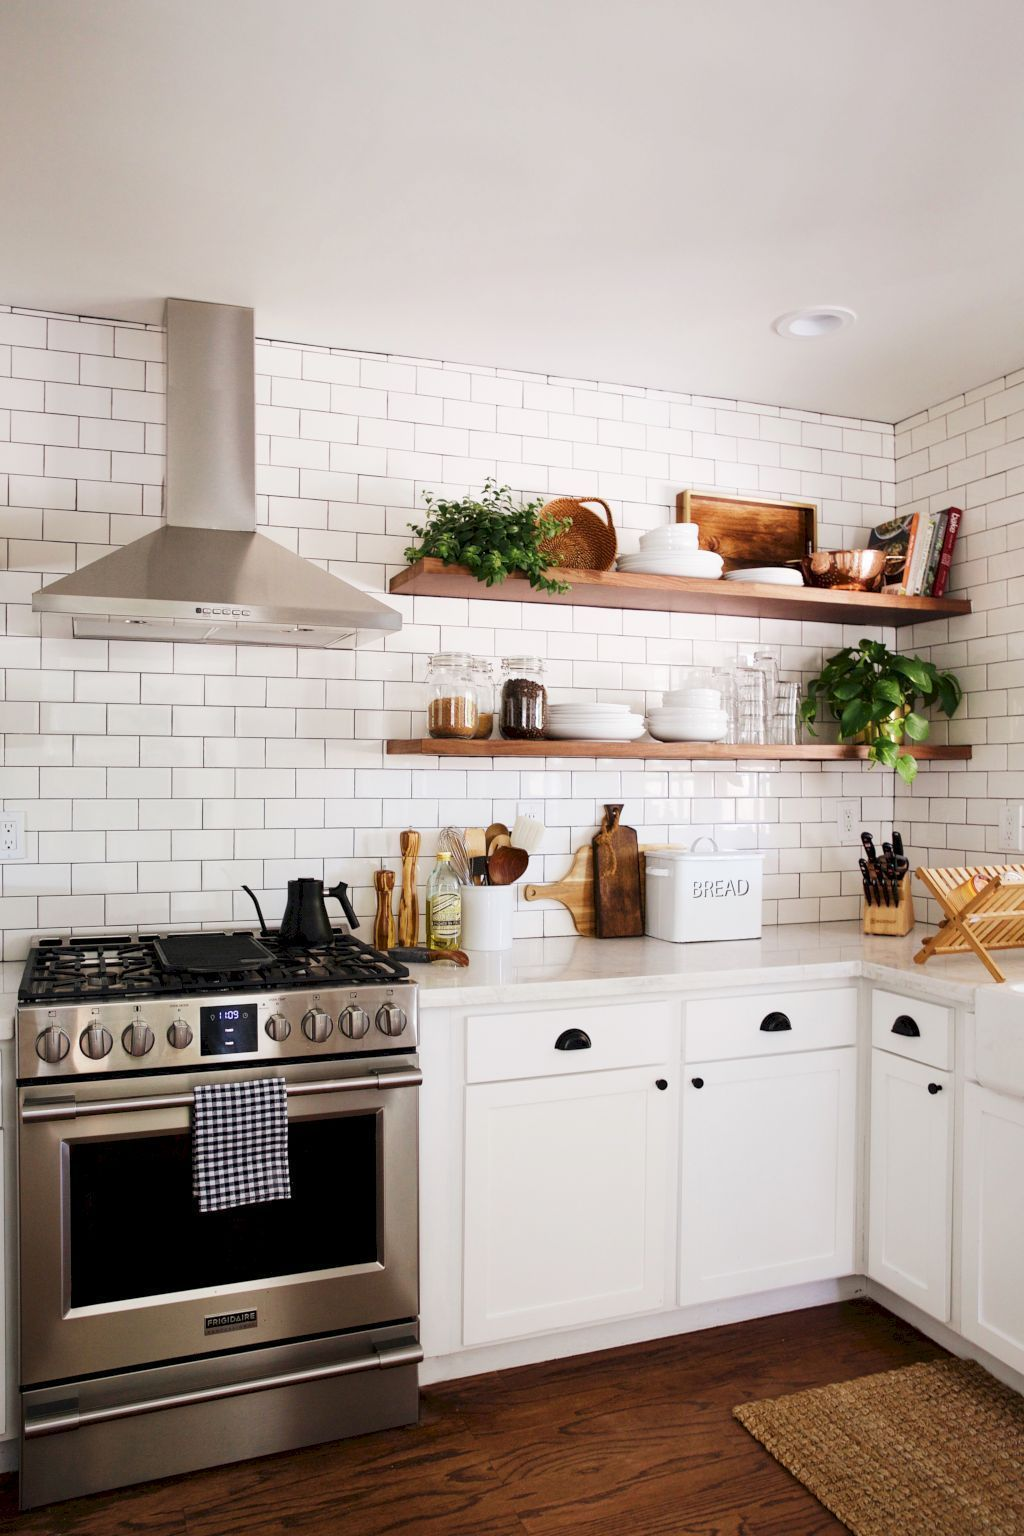 Modern Farmhouse Kitchen Decor Ideas 32 Home In 2019 Kitchen